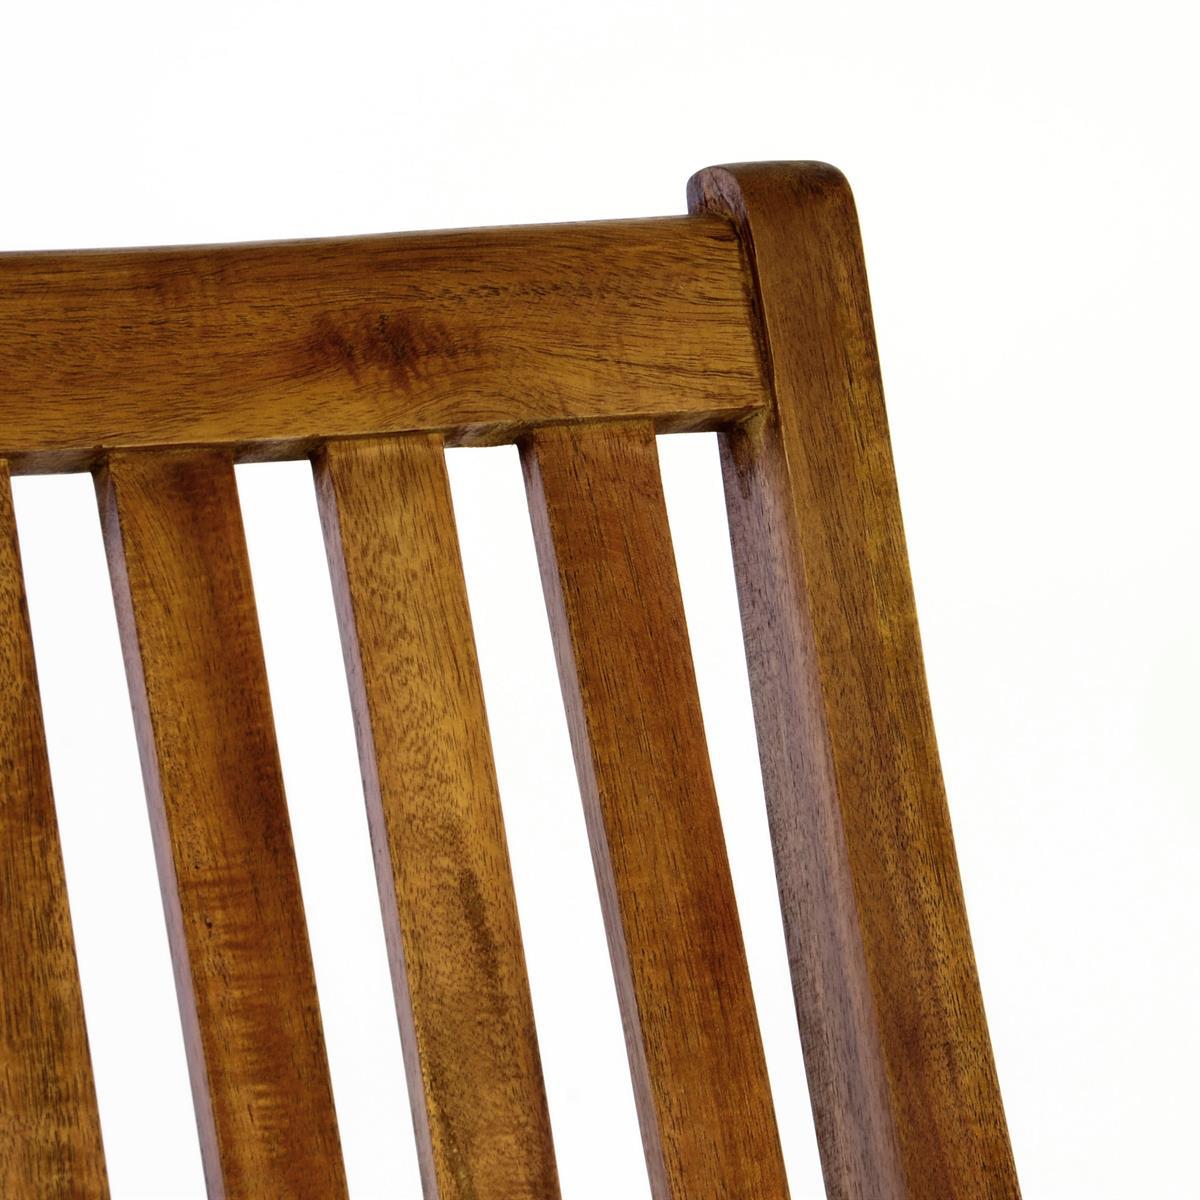 DIVERO 2er Set Gartenstuhl Hochlehner Klappstuhl Stuhl